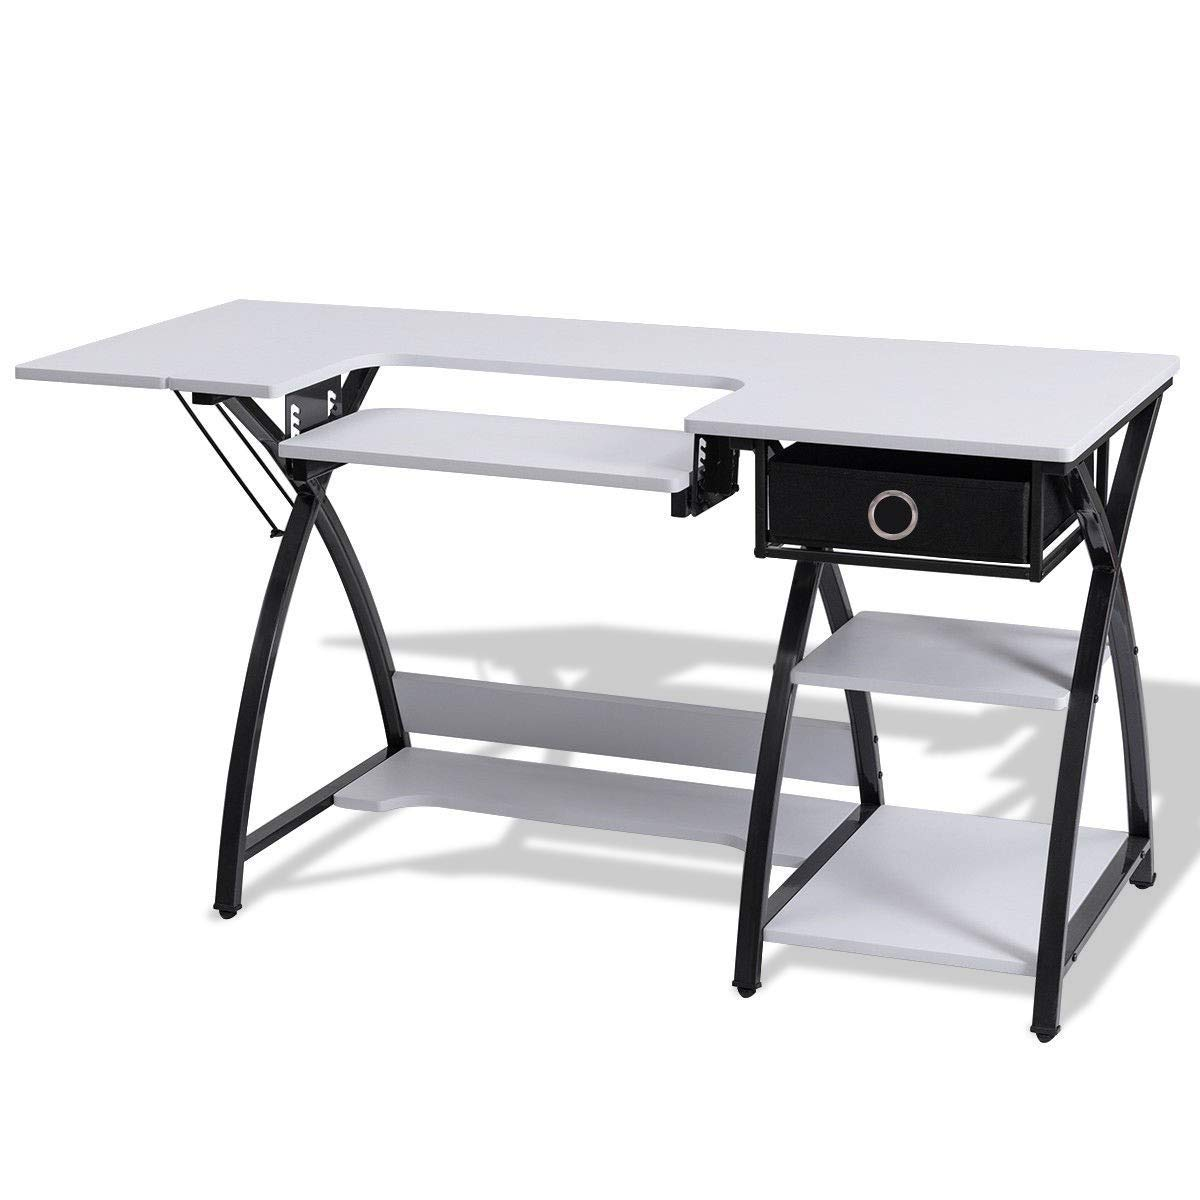 Sewing Craft Table Folding Computer Desk Adjustable Platform Side Shelf Storage Drawer Machine Cabinet BeUniquetoday